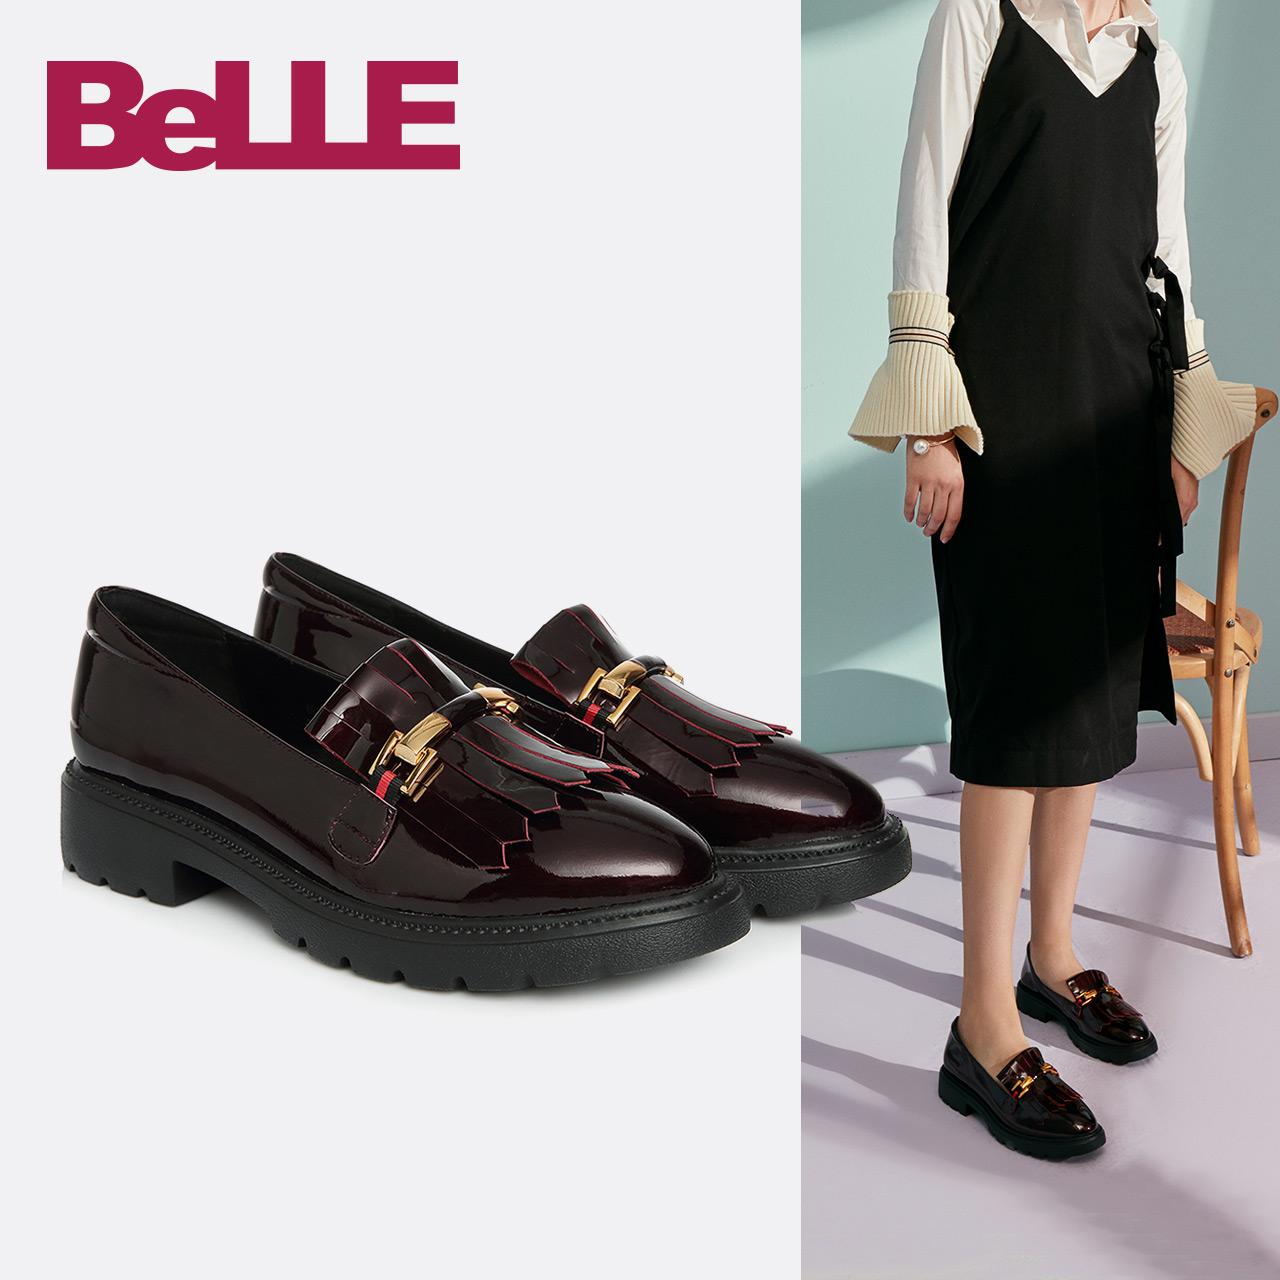 Belle-百丽单鞋2018春商场乐福漆牛皮流苏平跟女鞋S2E1DAM8